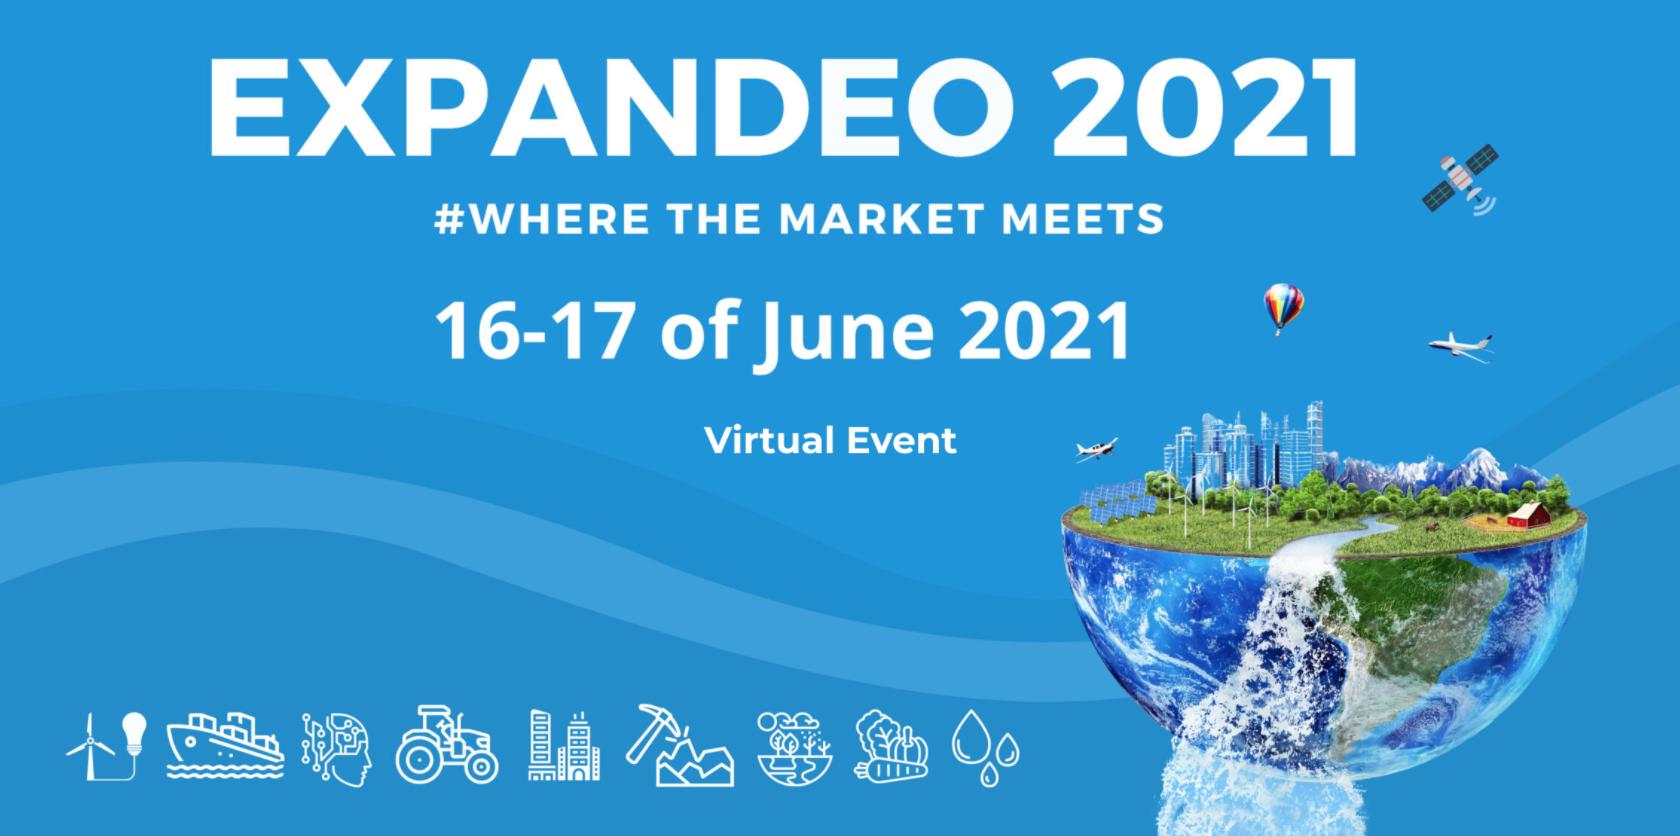 EXPANDEO 2021